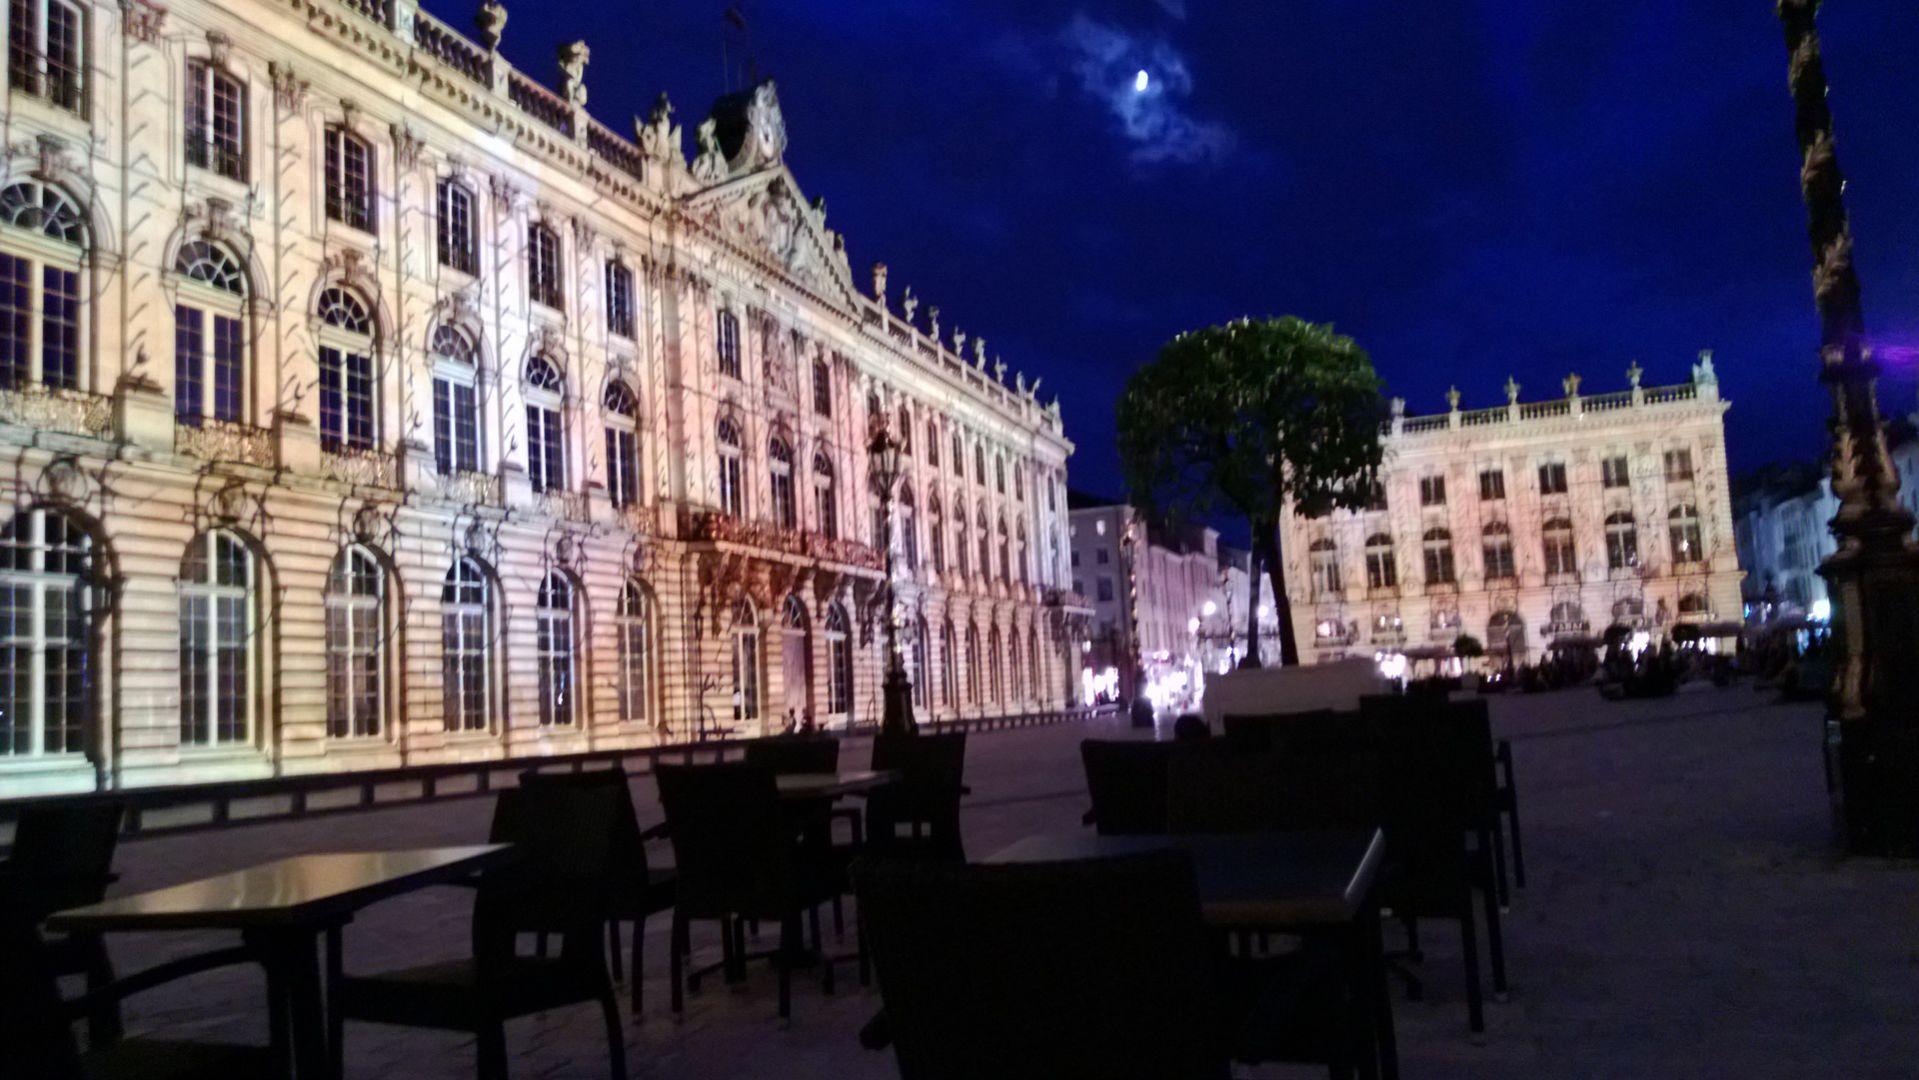 Place Stanislas de nuit - Lumia 920 - 2